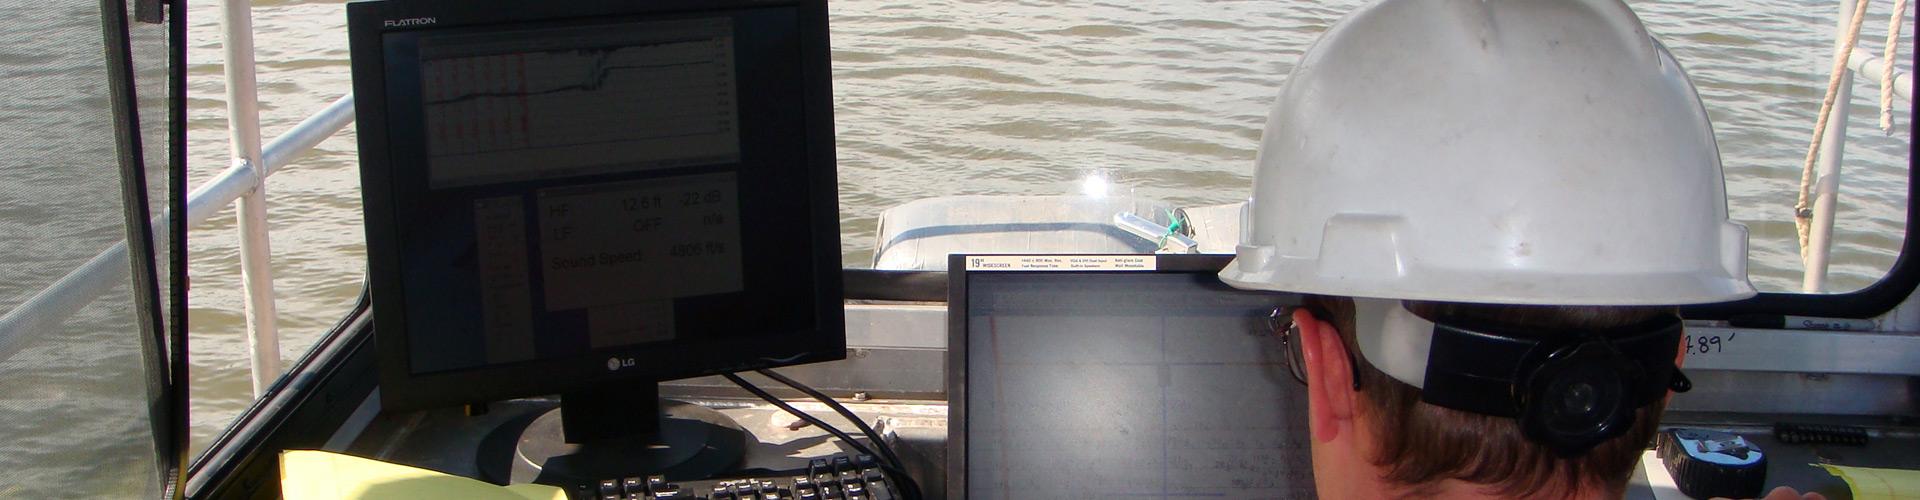 bathymetric survey, hydrographic survey, water surveys, river surveys, marine construction